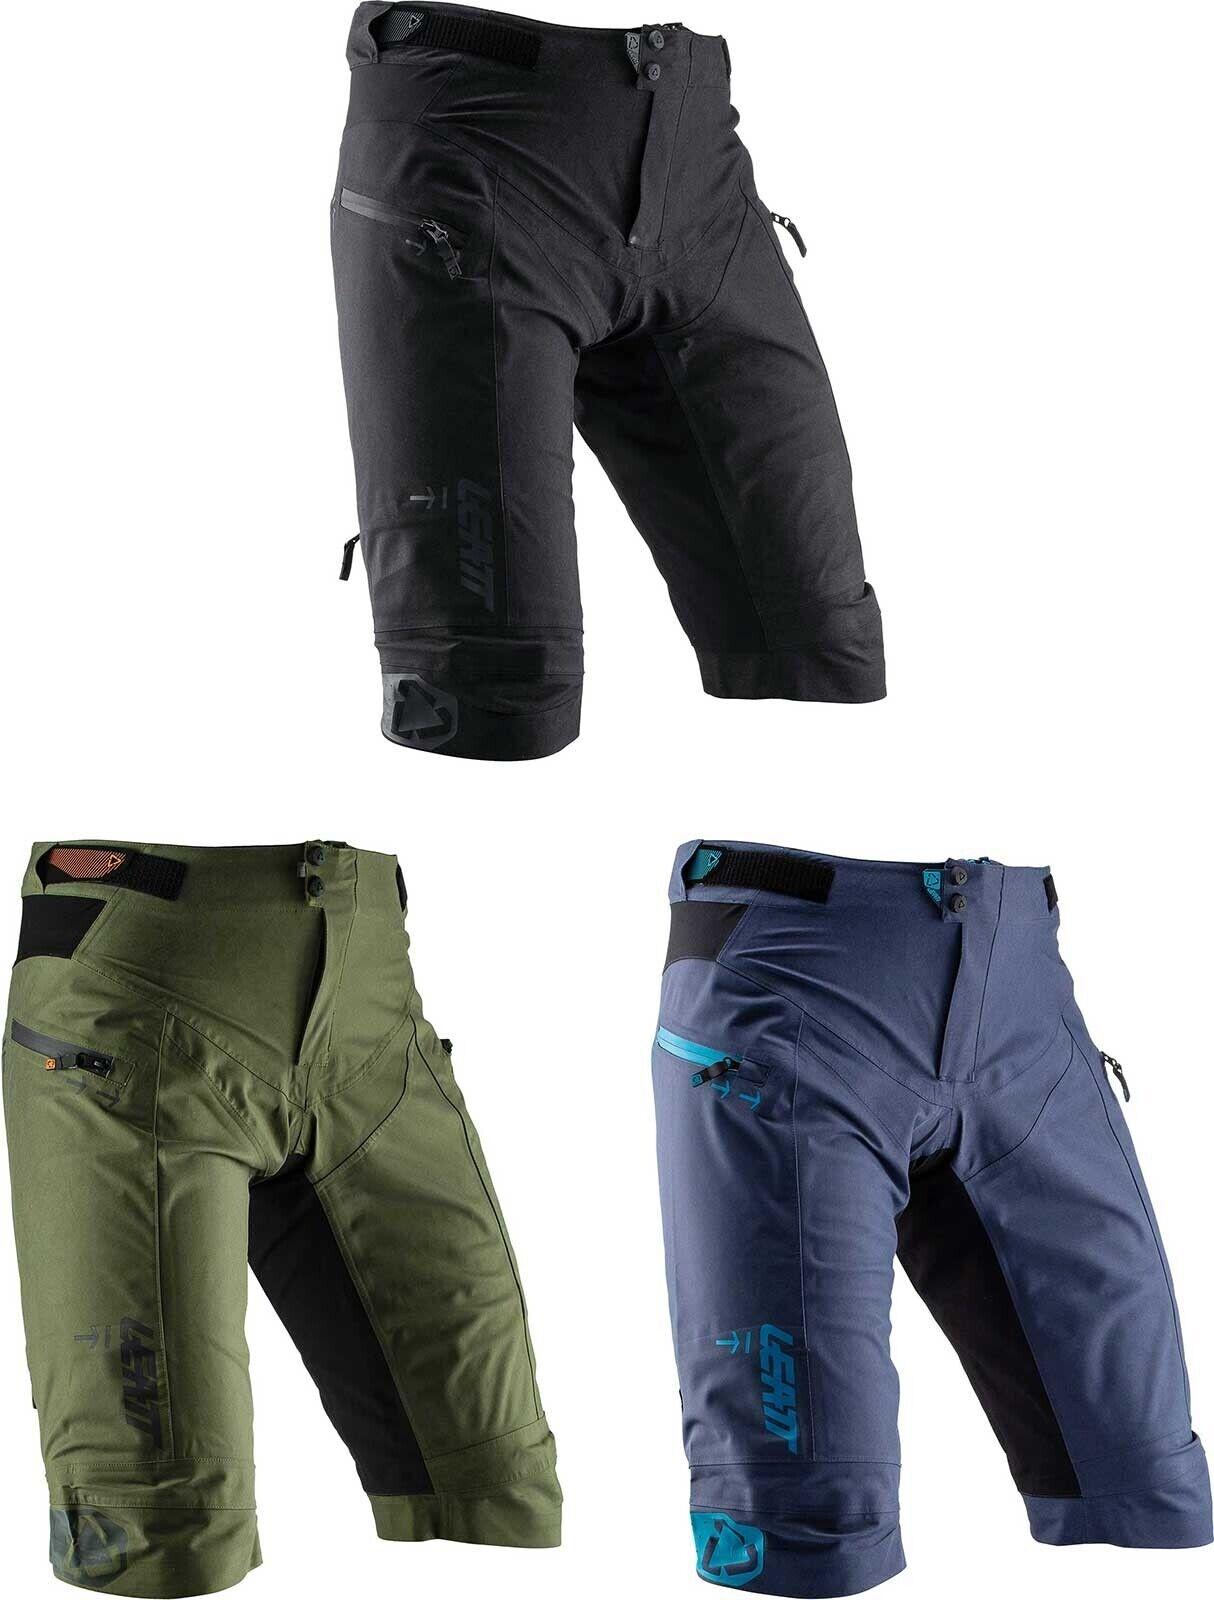 Leatt DBX 1.0 Adult Off-Road BMX Cycling Shorts